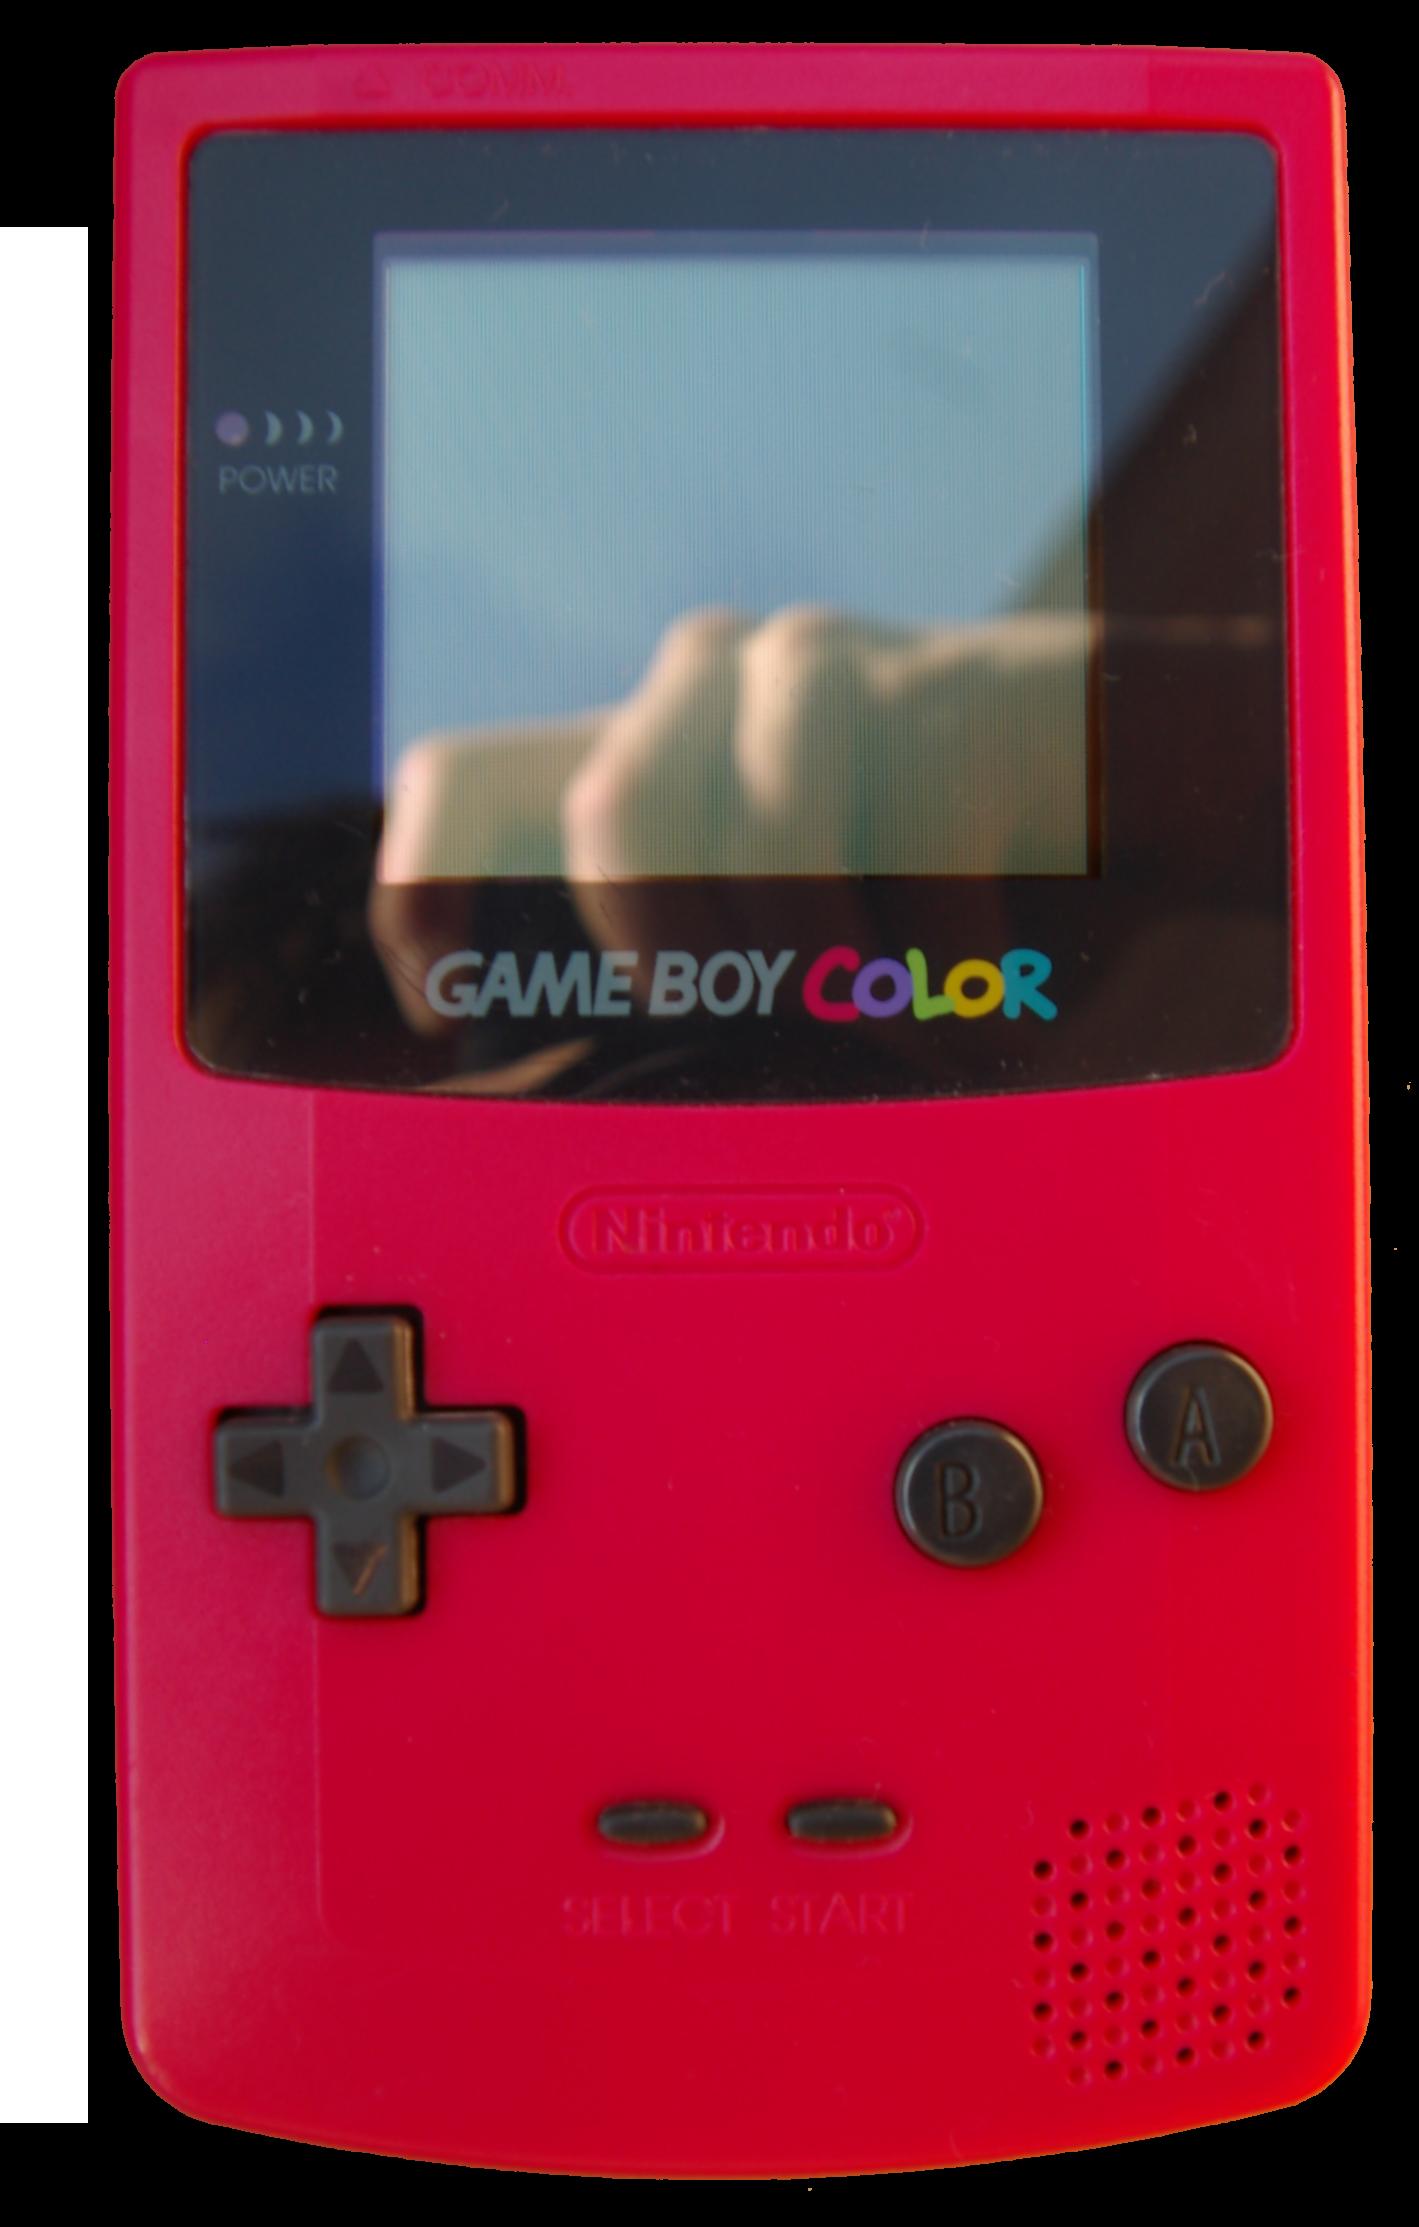 File:Game Boy Color.png.